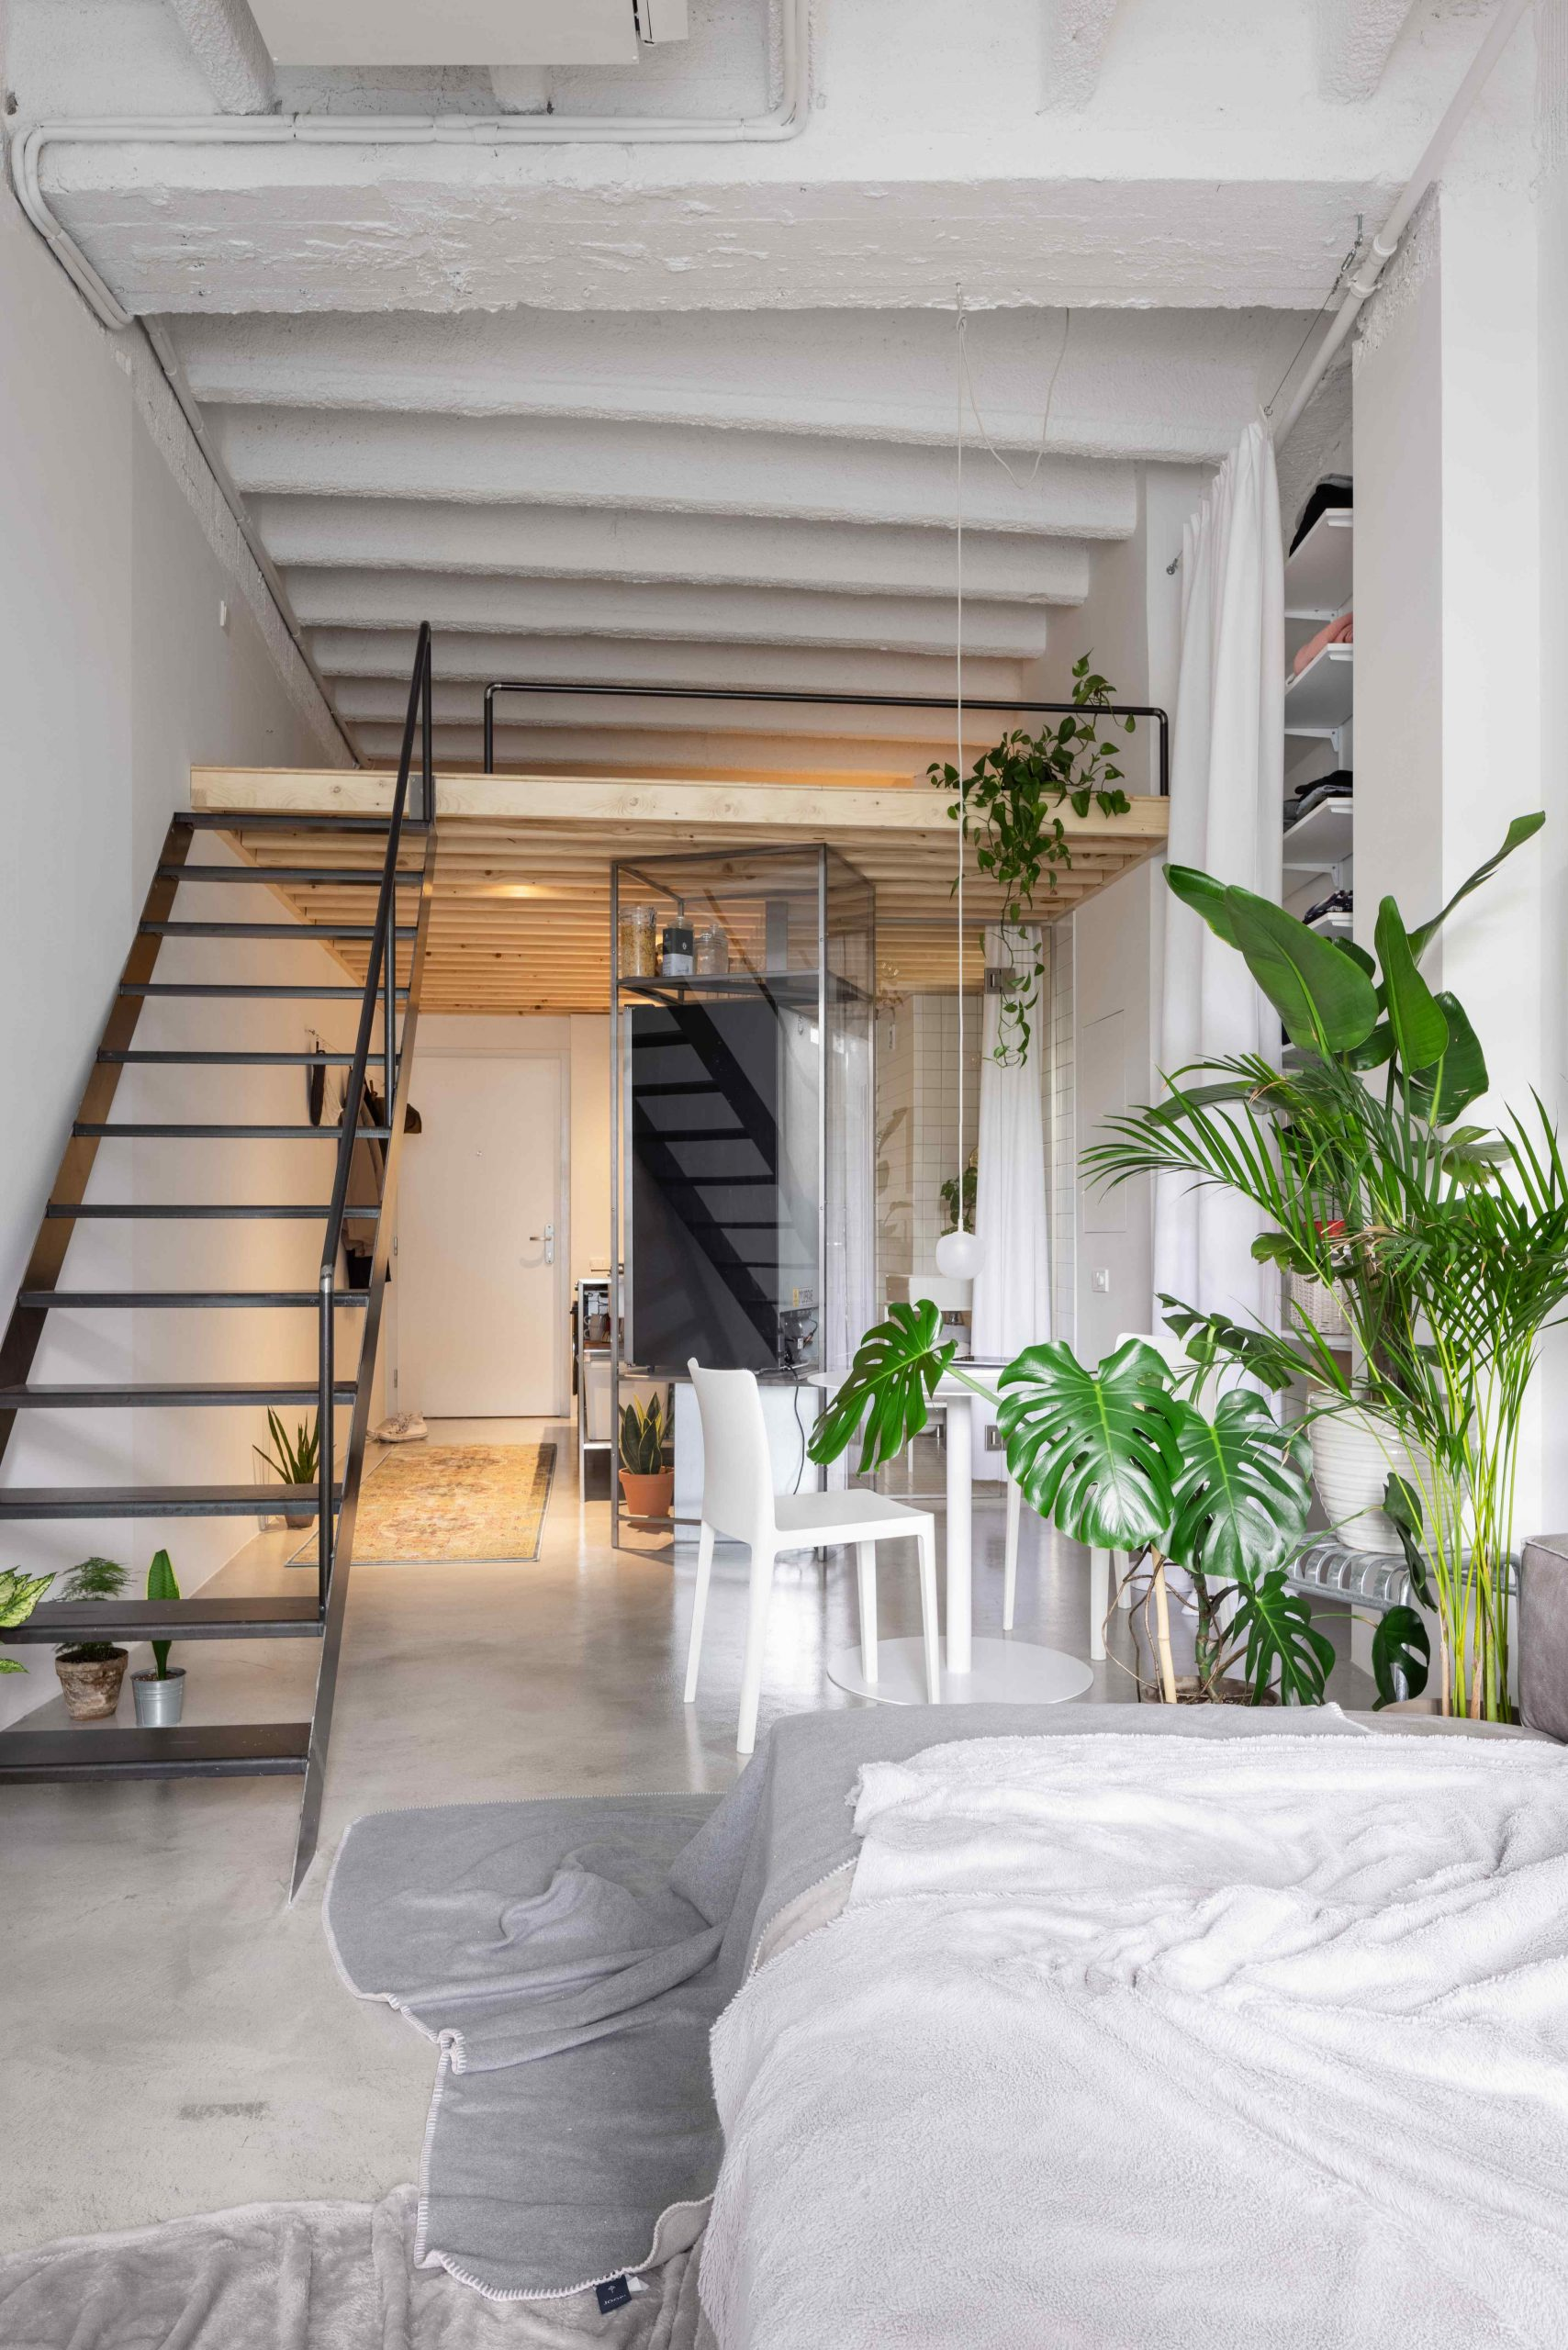 Malý víkendový loft